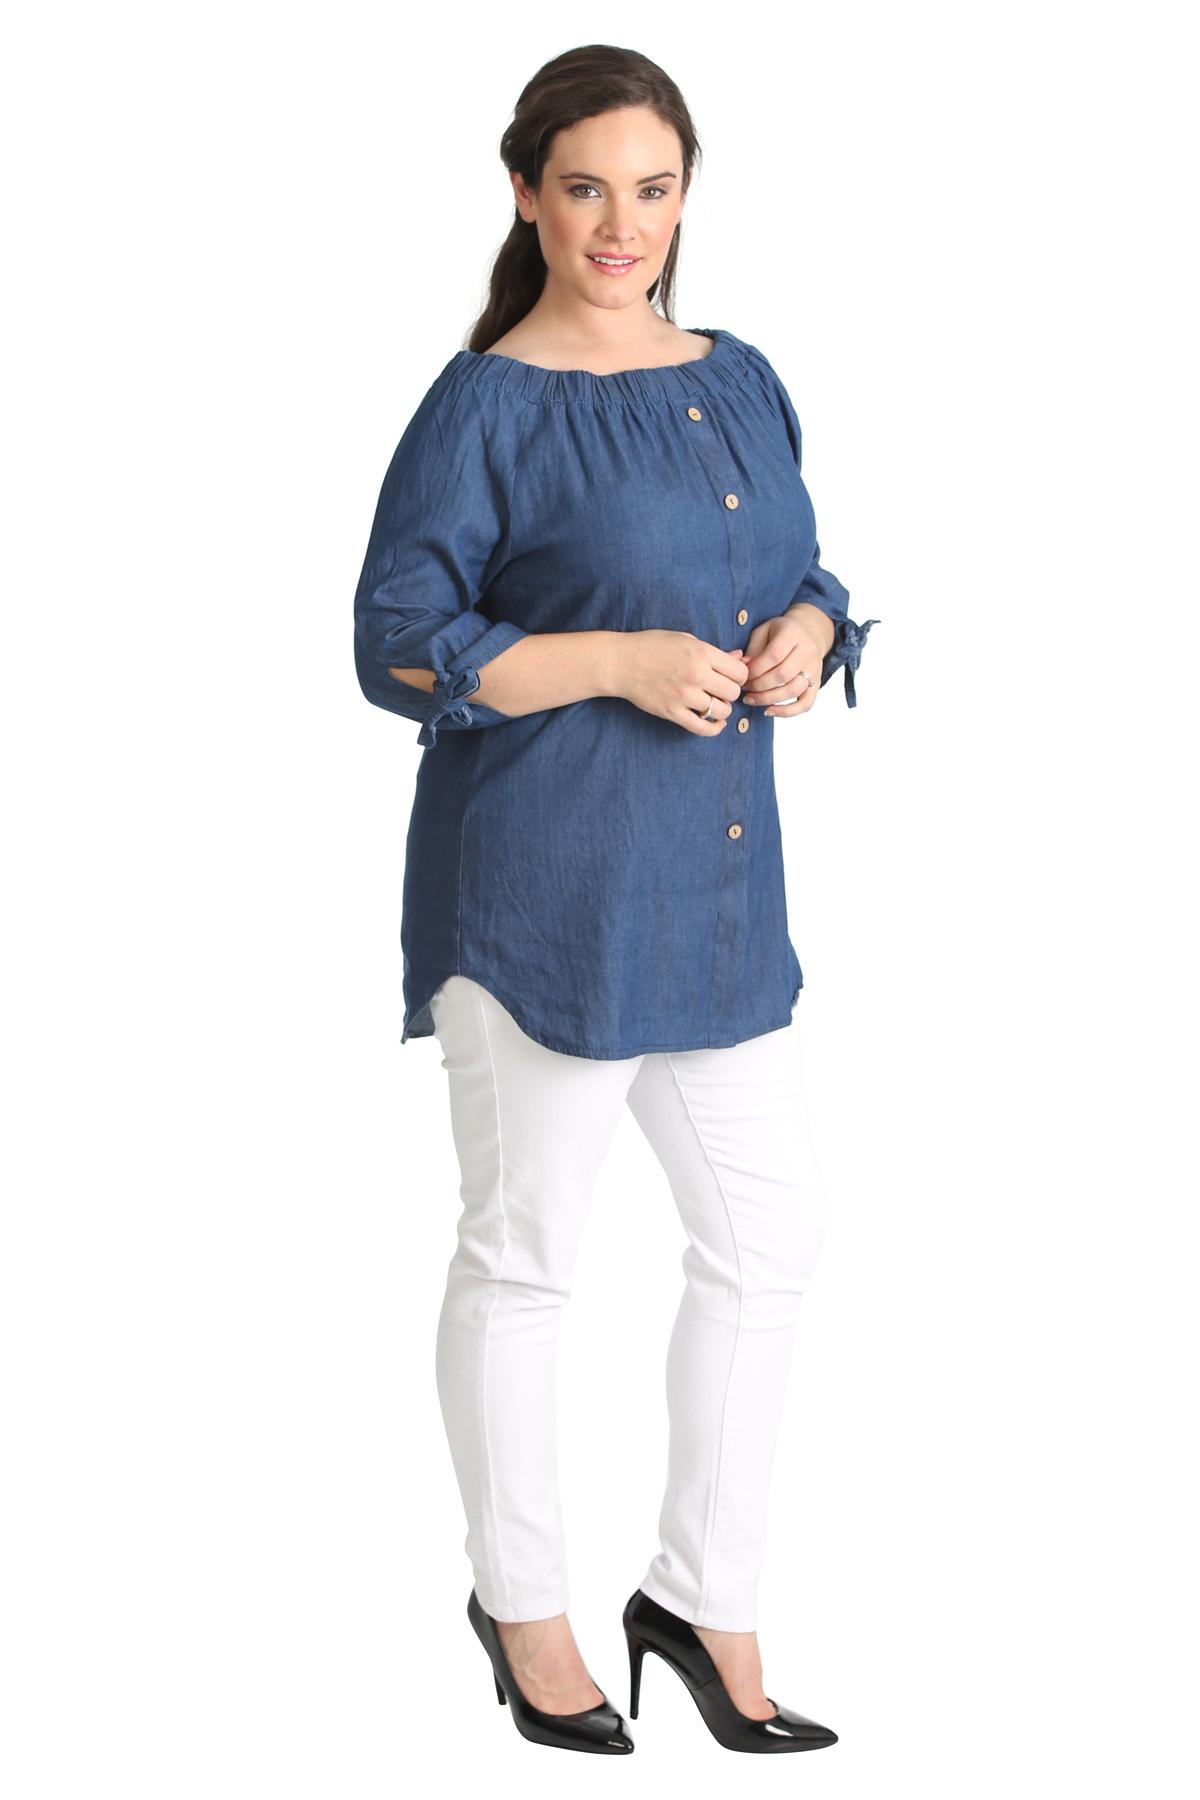 New Ladies Plus Size Top Bardot Button Denim Style Shirt